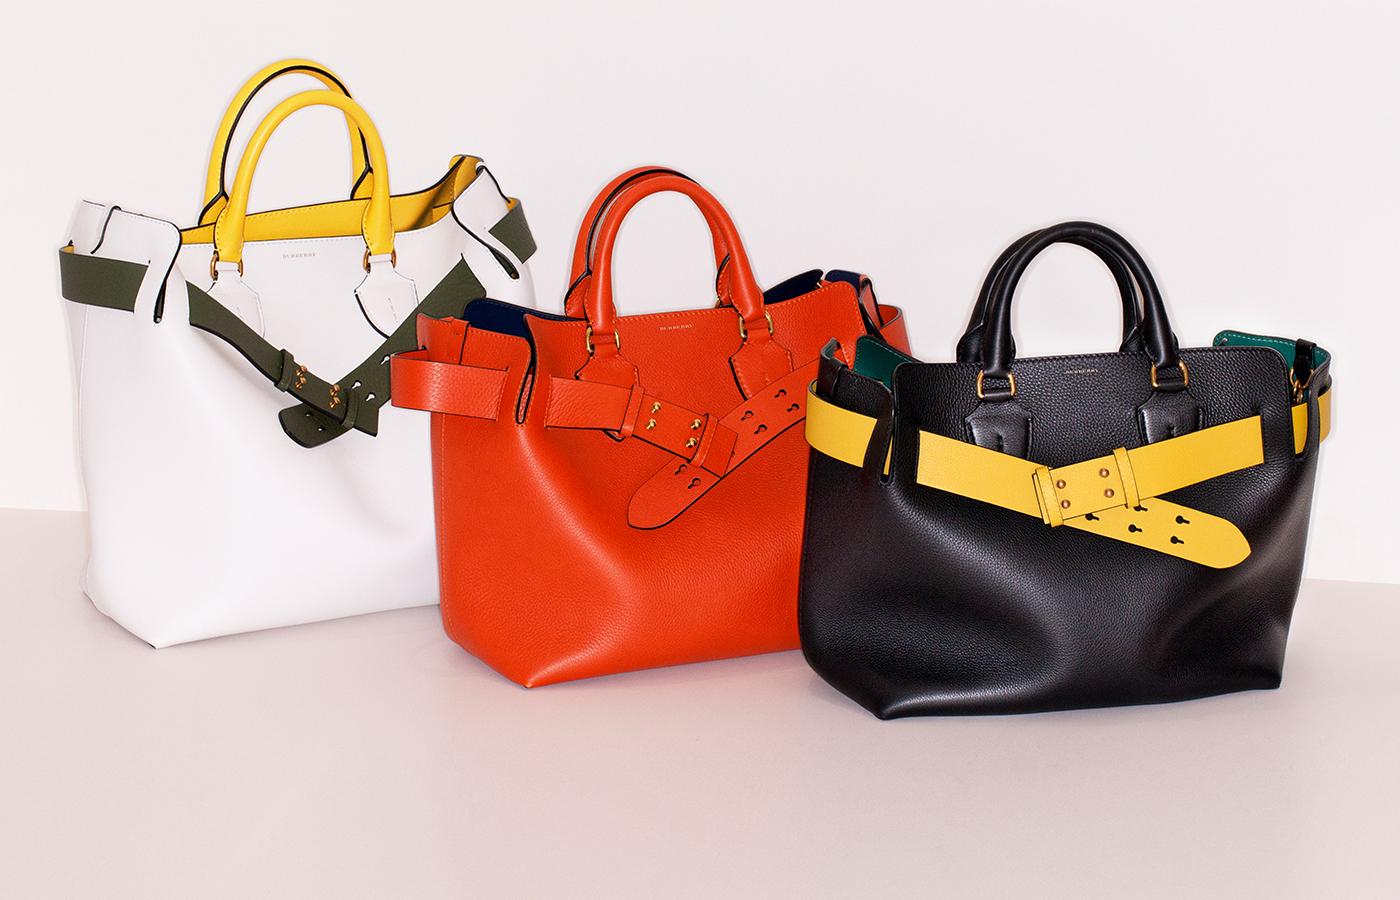 f3fd7d151f52 Burberry introduce the Belt Bag – The Glass Magazine